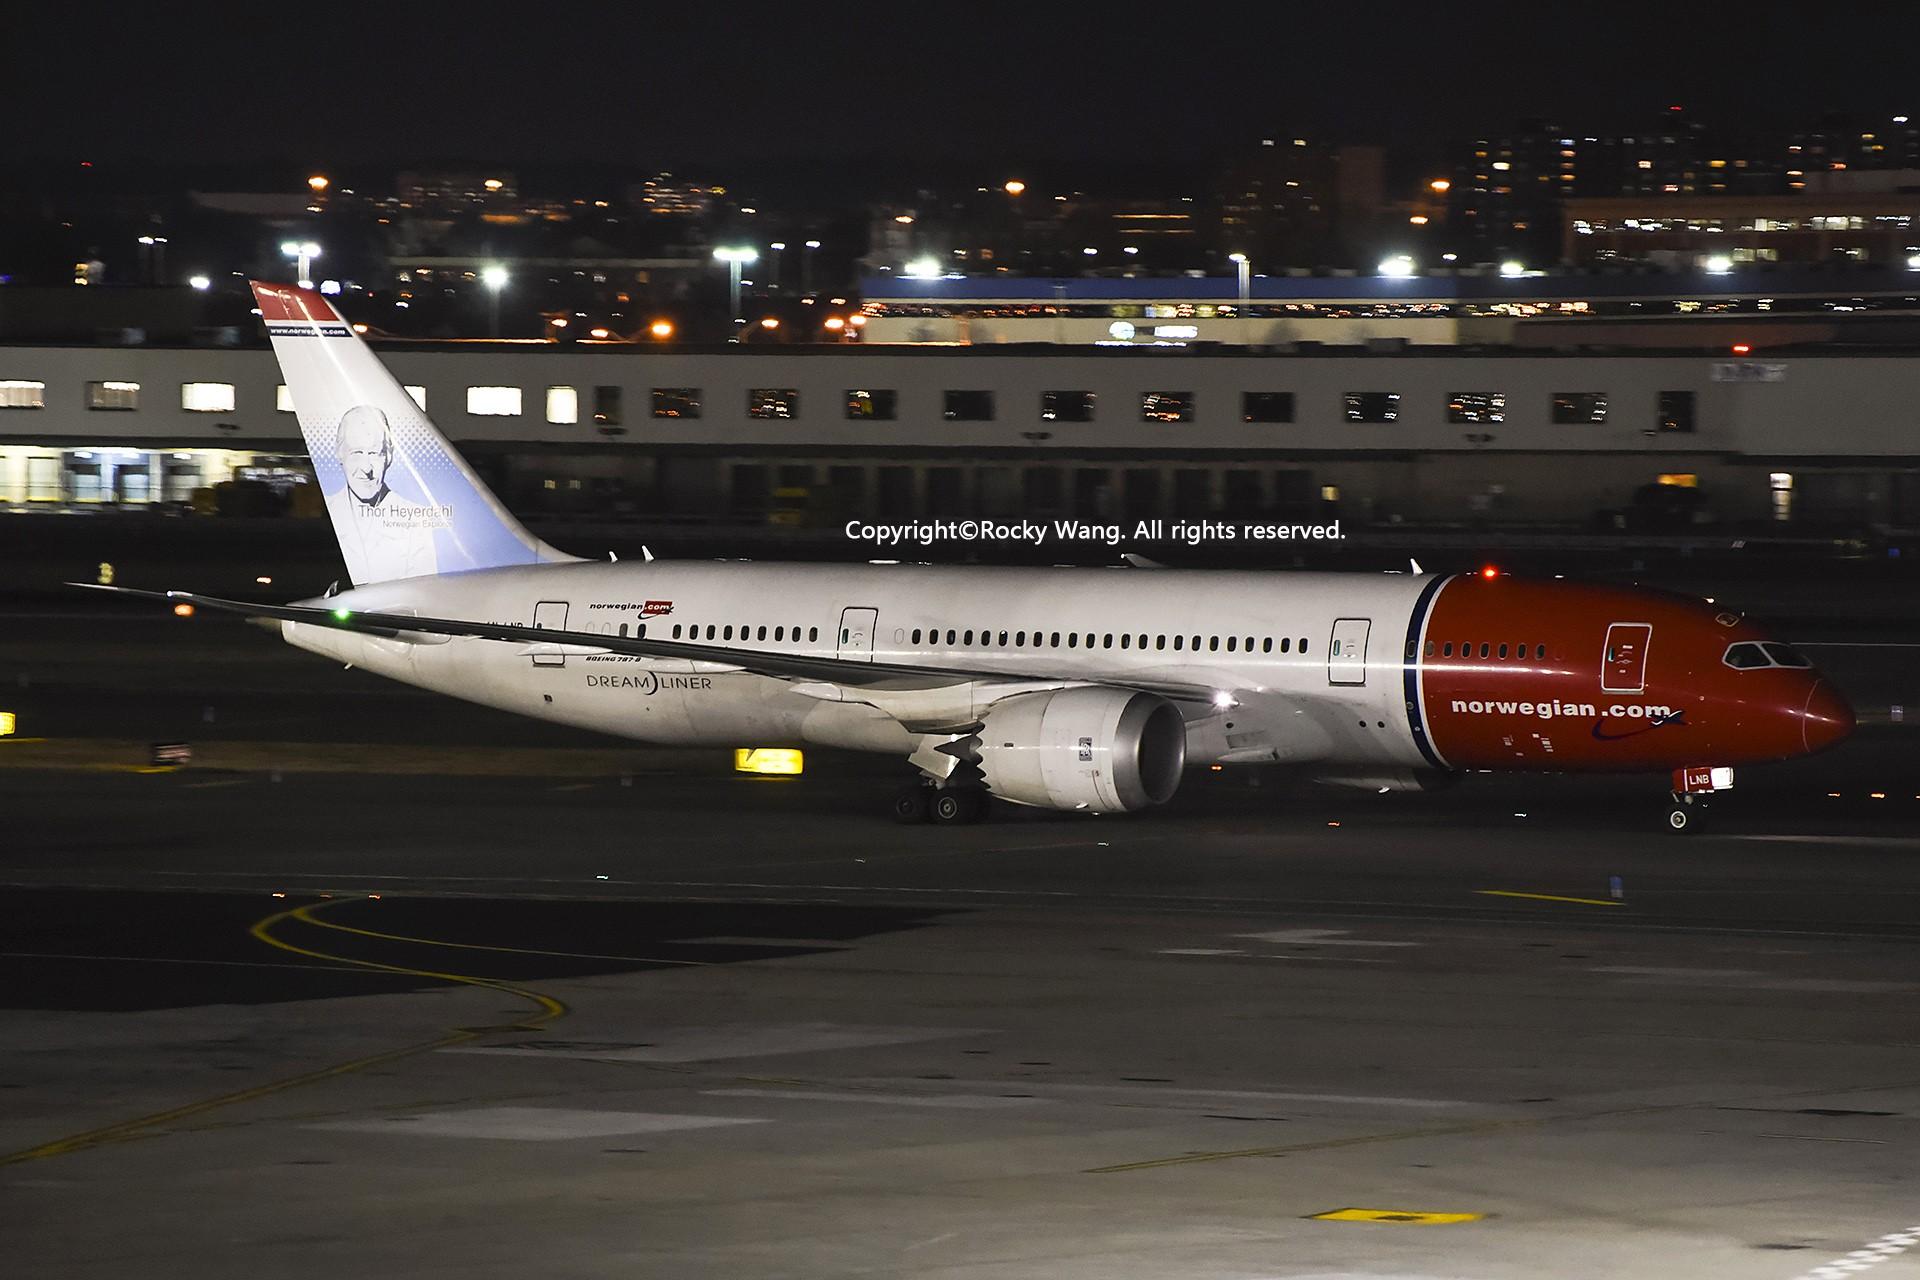 Re:[原创]KJFK 30图 BOEING 787-8 DREAMLINER LN-LNB New York John F. Kennedy Int'l Airport